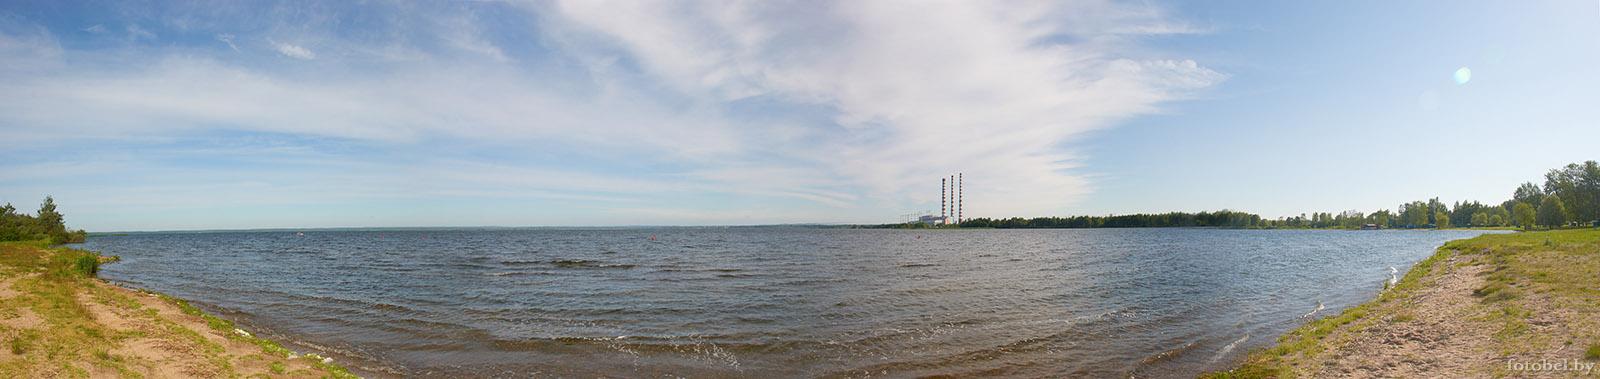 озеро омшаное владимир рыбалка